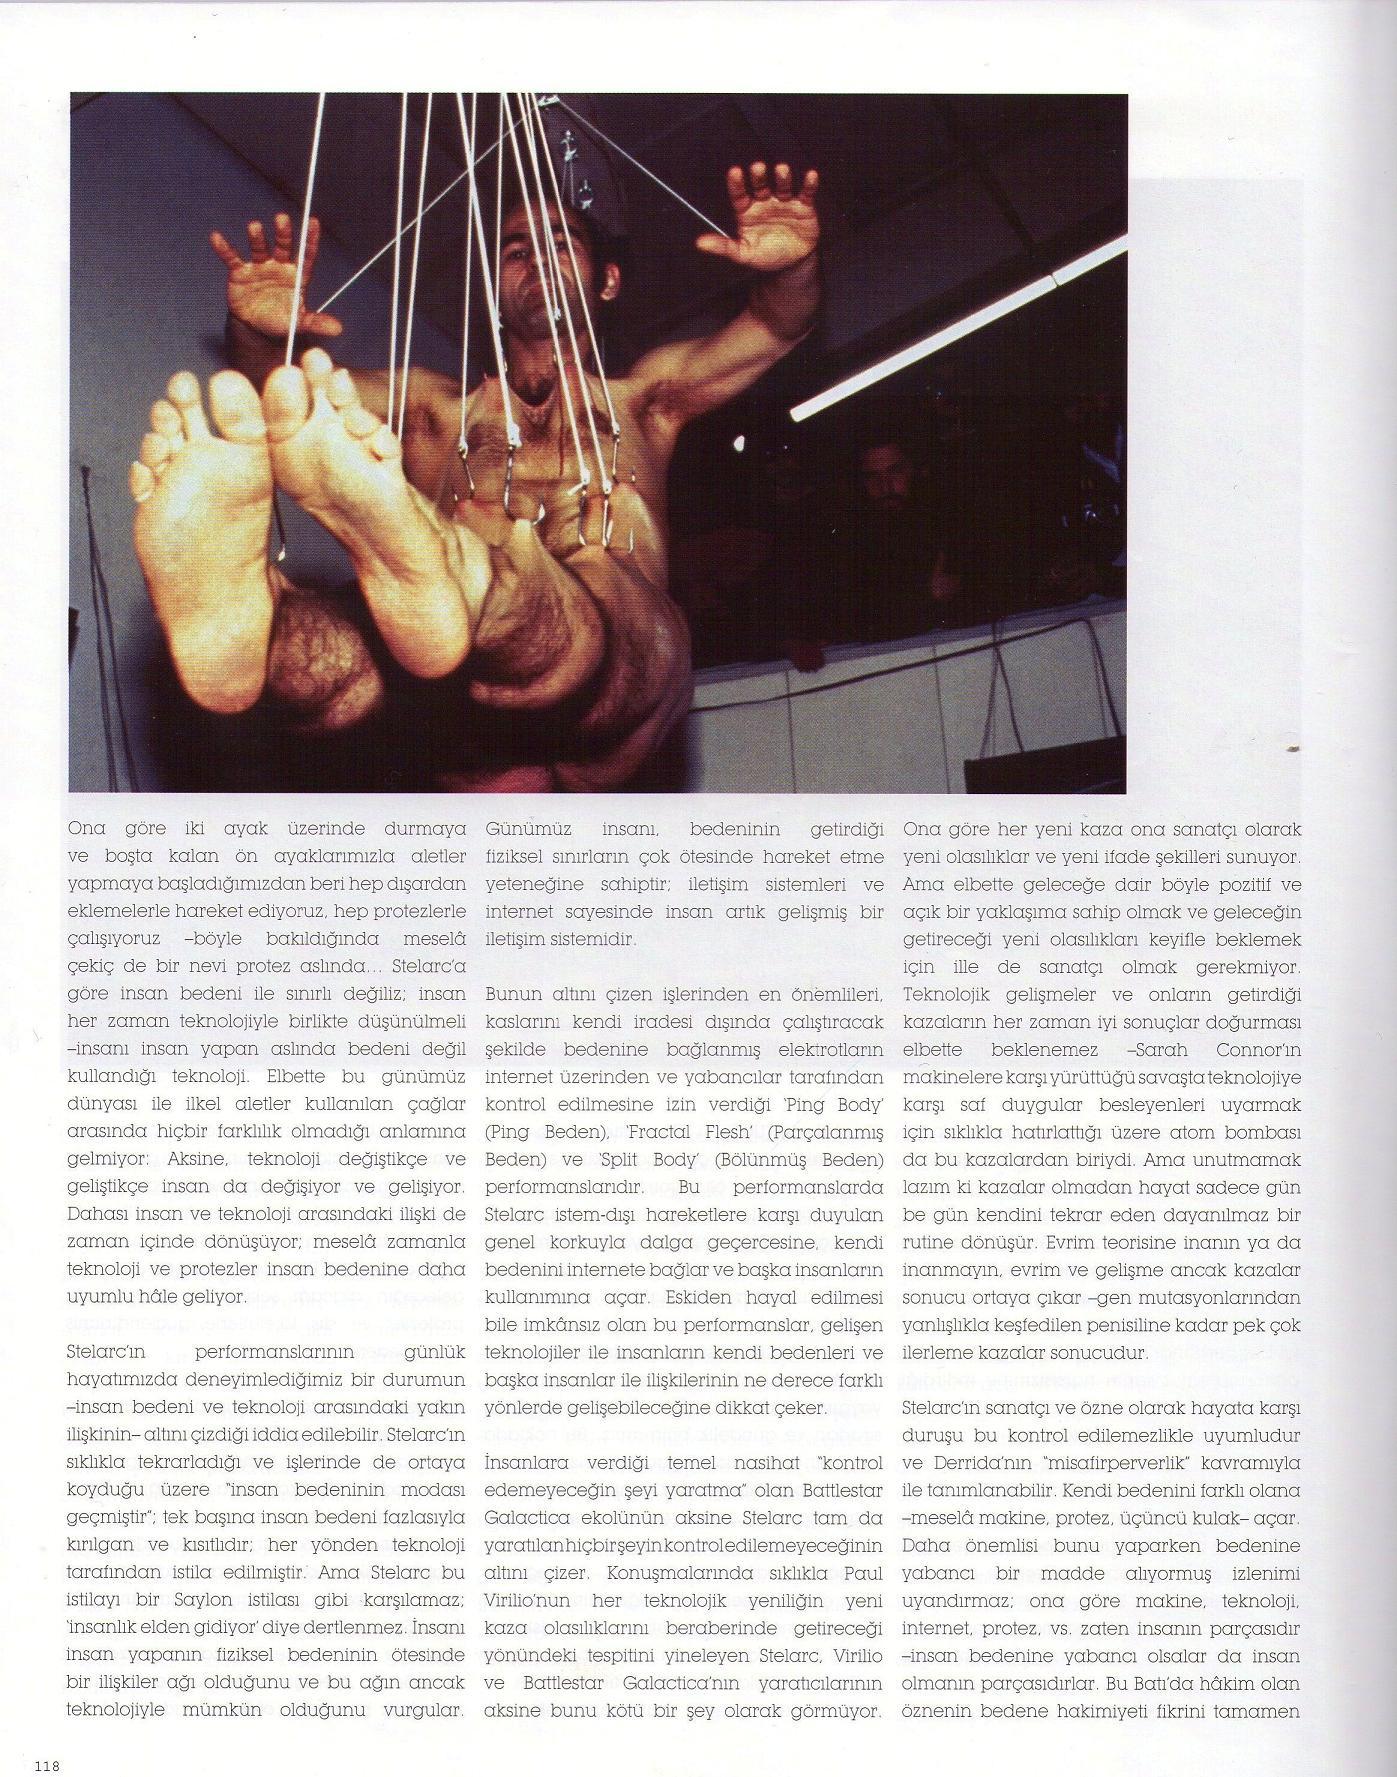 Bant_07-08.2009_haber_3.JPG